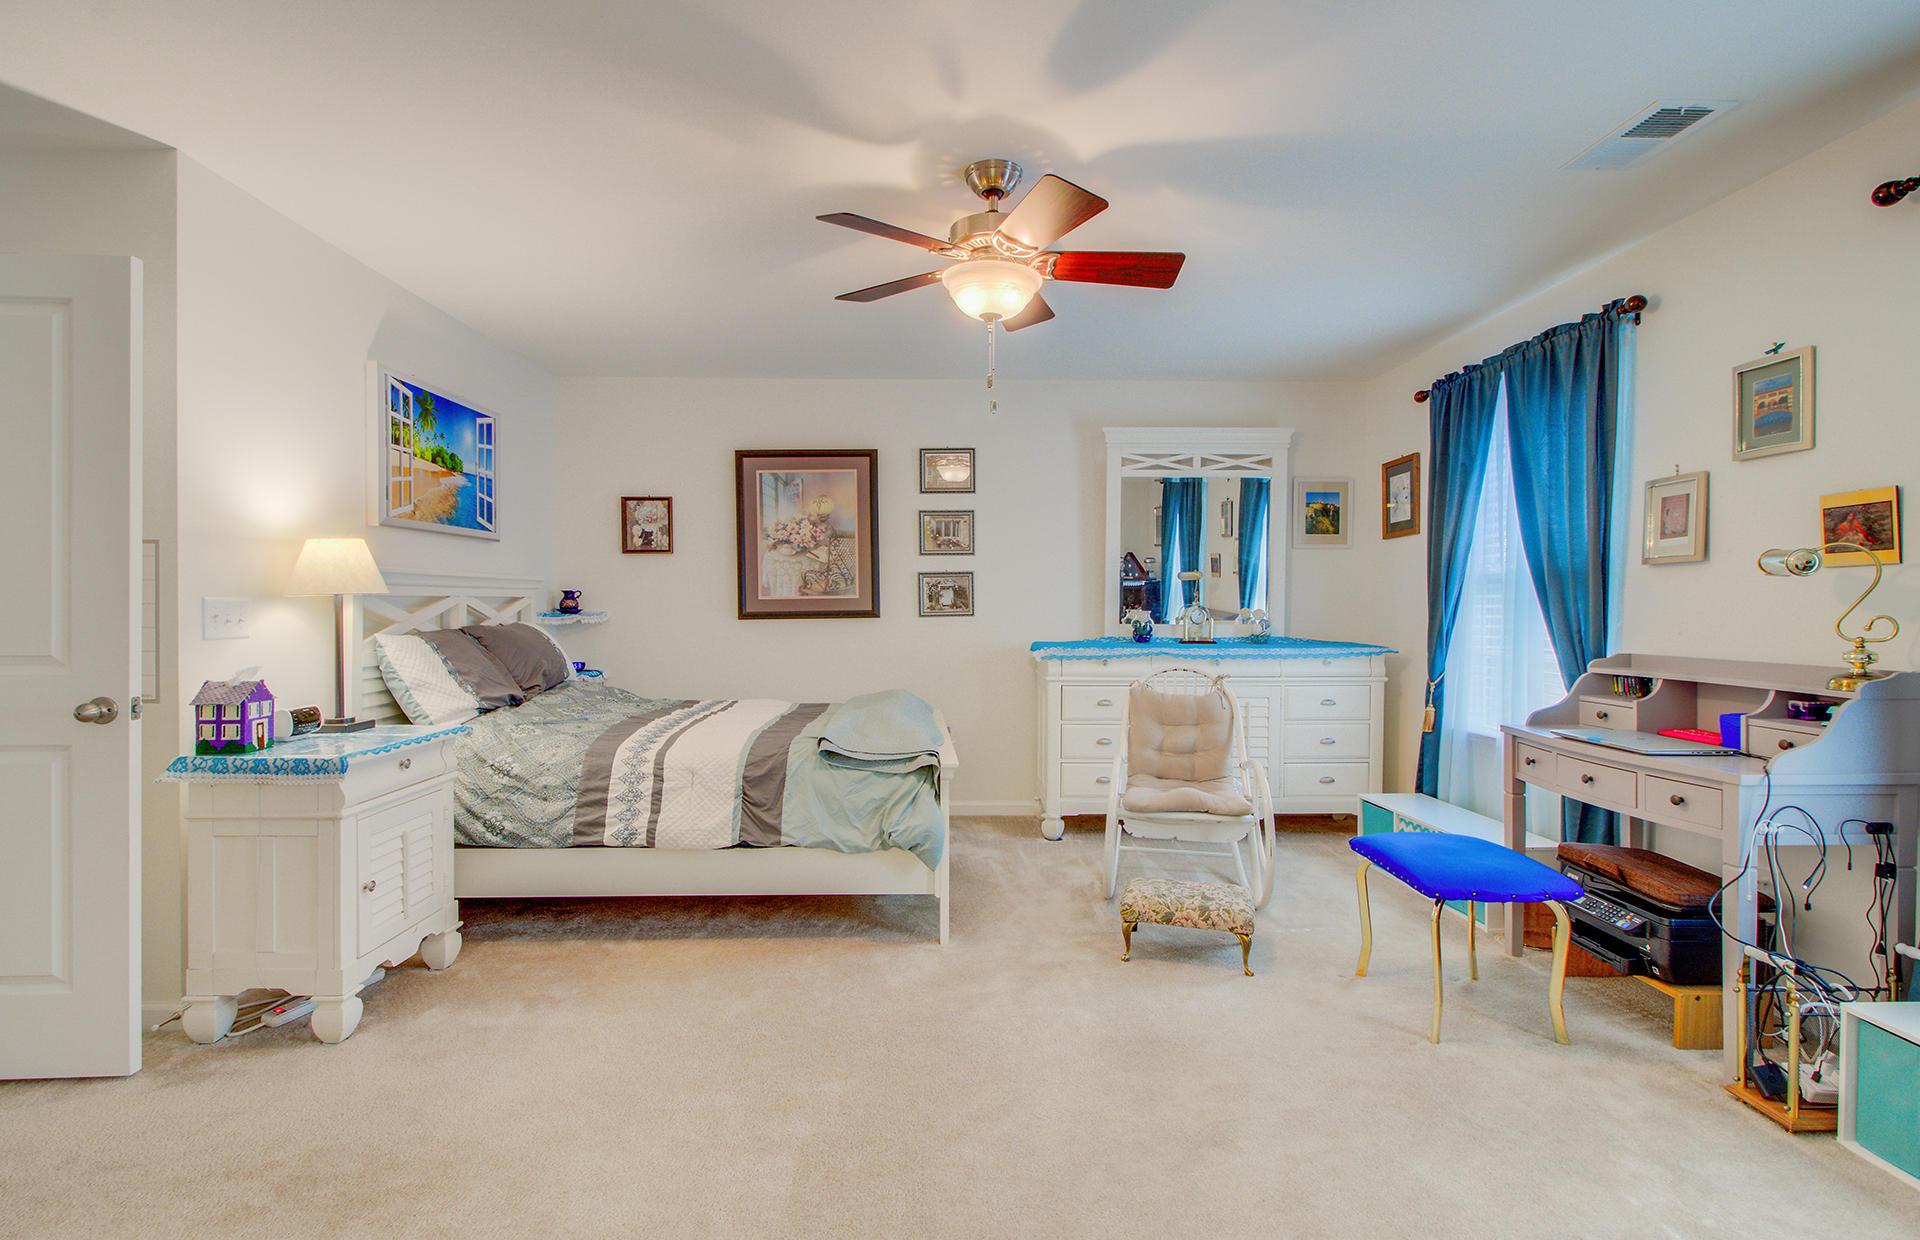 Cane Bay Plantation Homes For Sale - 255 Spectrum, Summerville, SC - 22